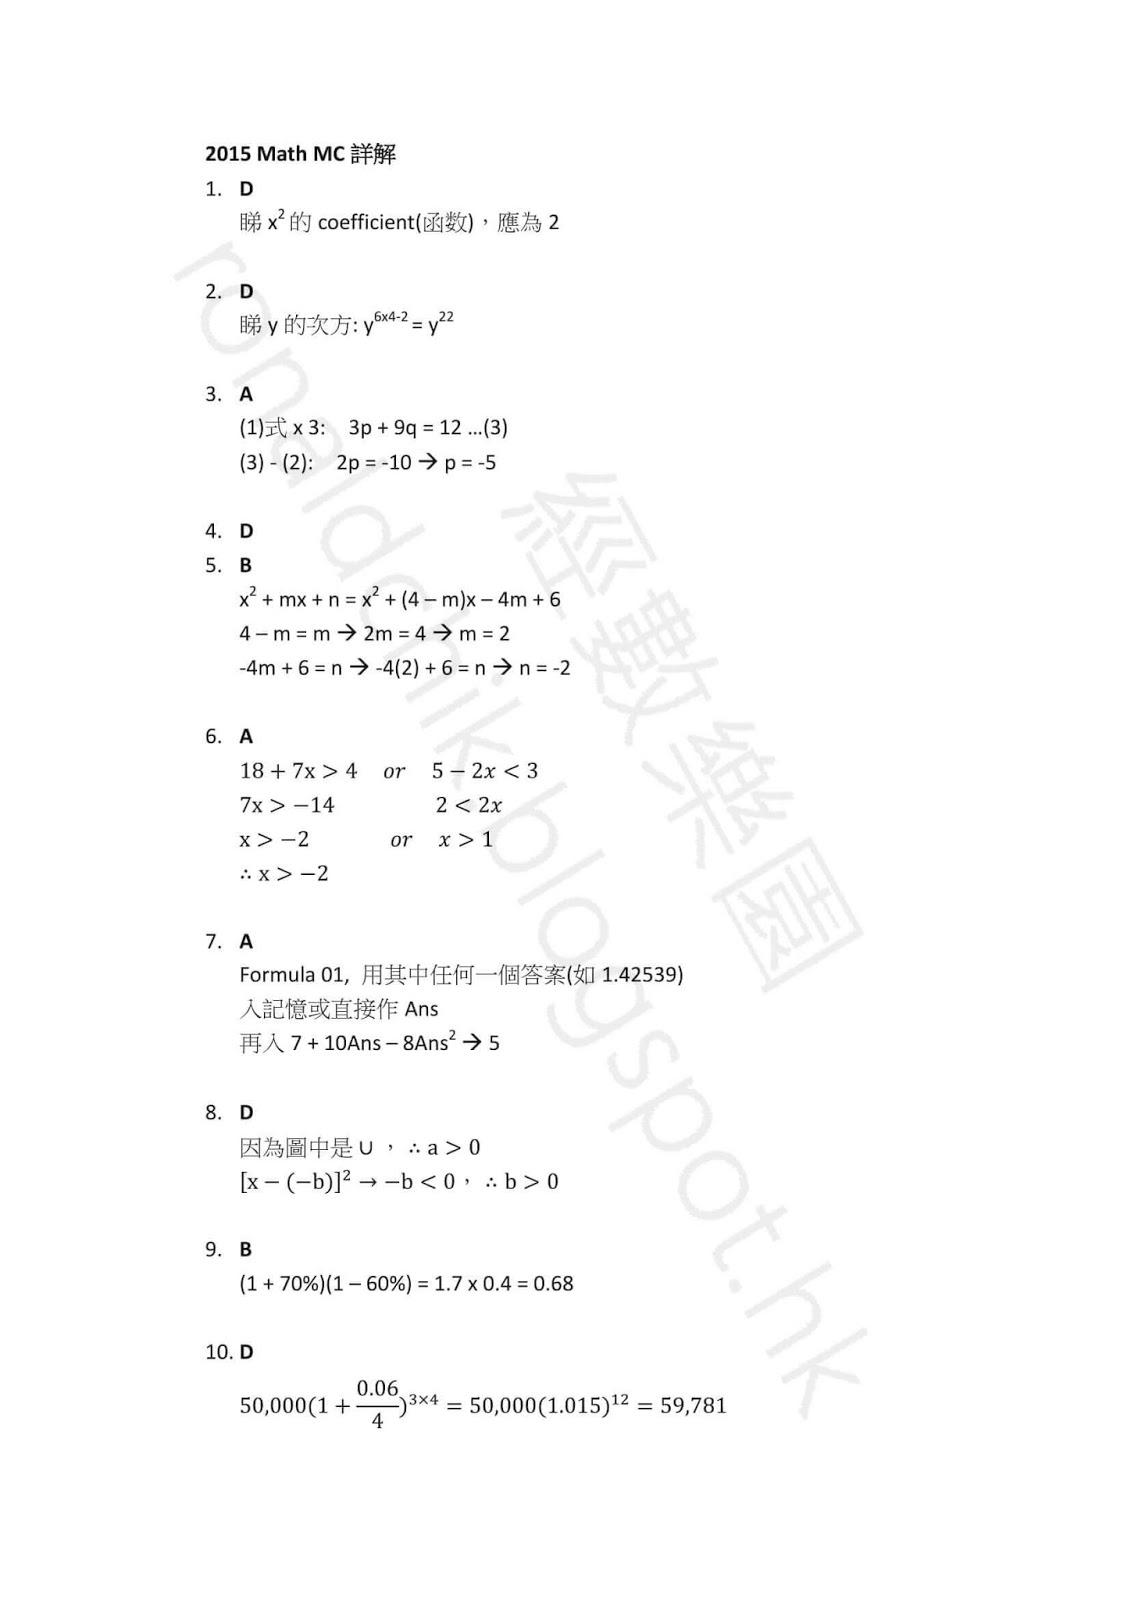 2015 DSE Math 數學 Paper 2 MC 卷二 答案 Q1,2,3,4,5,6,7,8,9,10